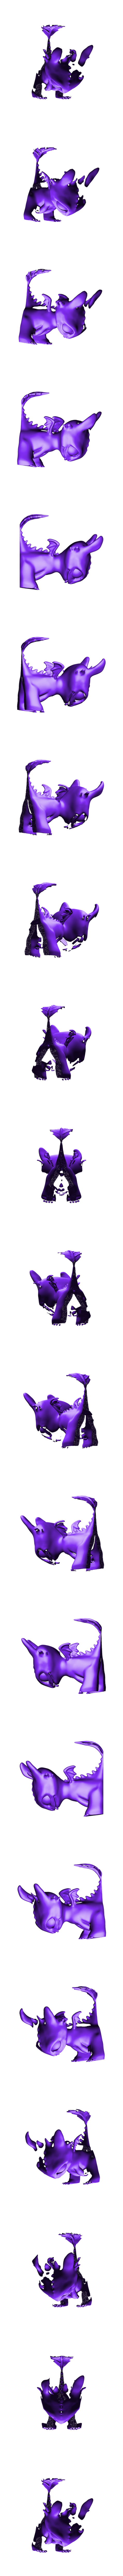 Toothless_Without_Supports.stl Télécharger fichier STL Krokmou • Plan pour impression 3D, derailed